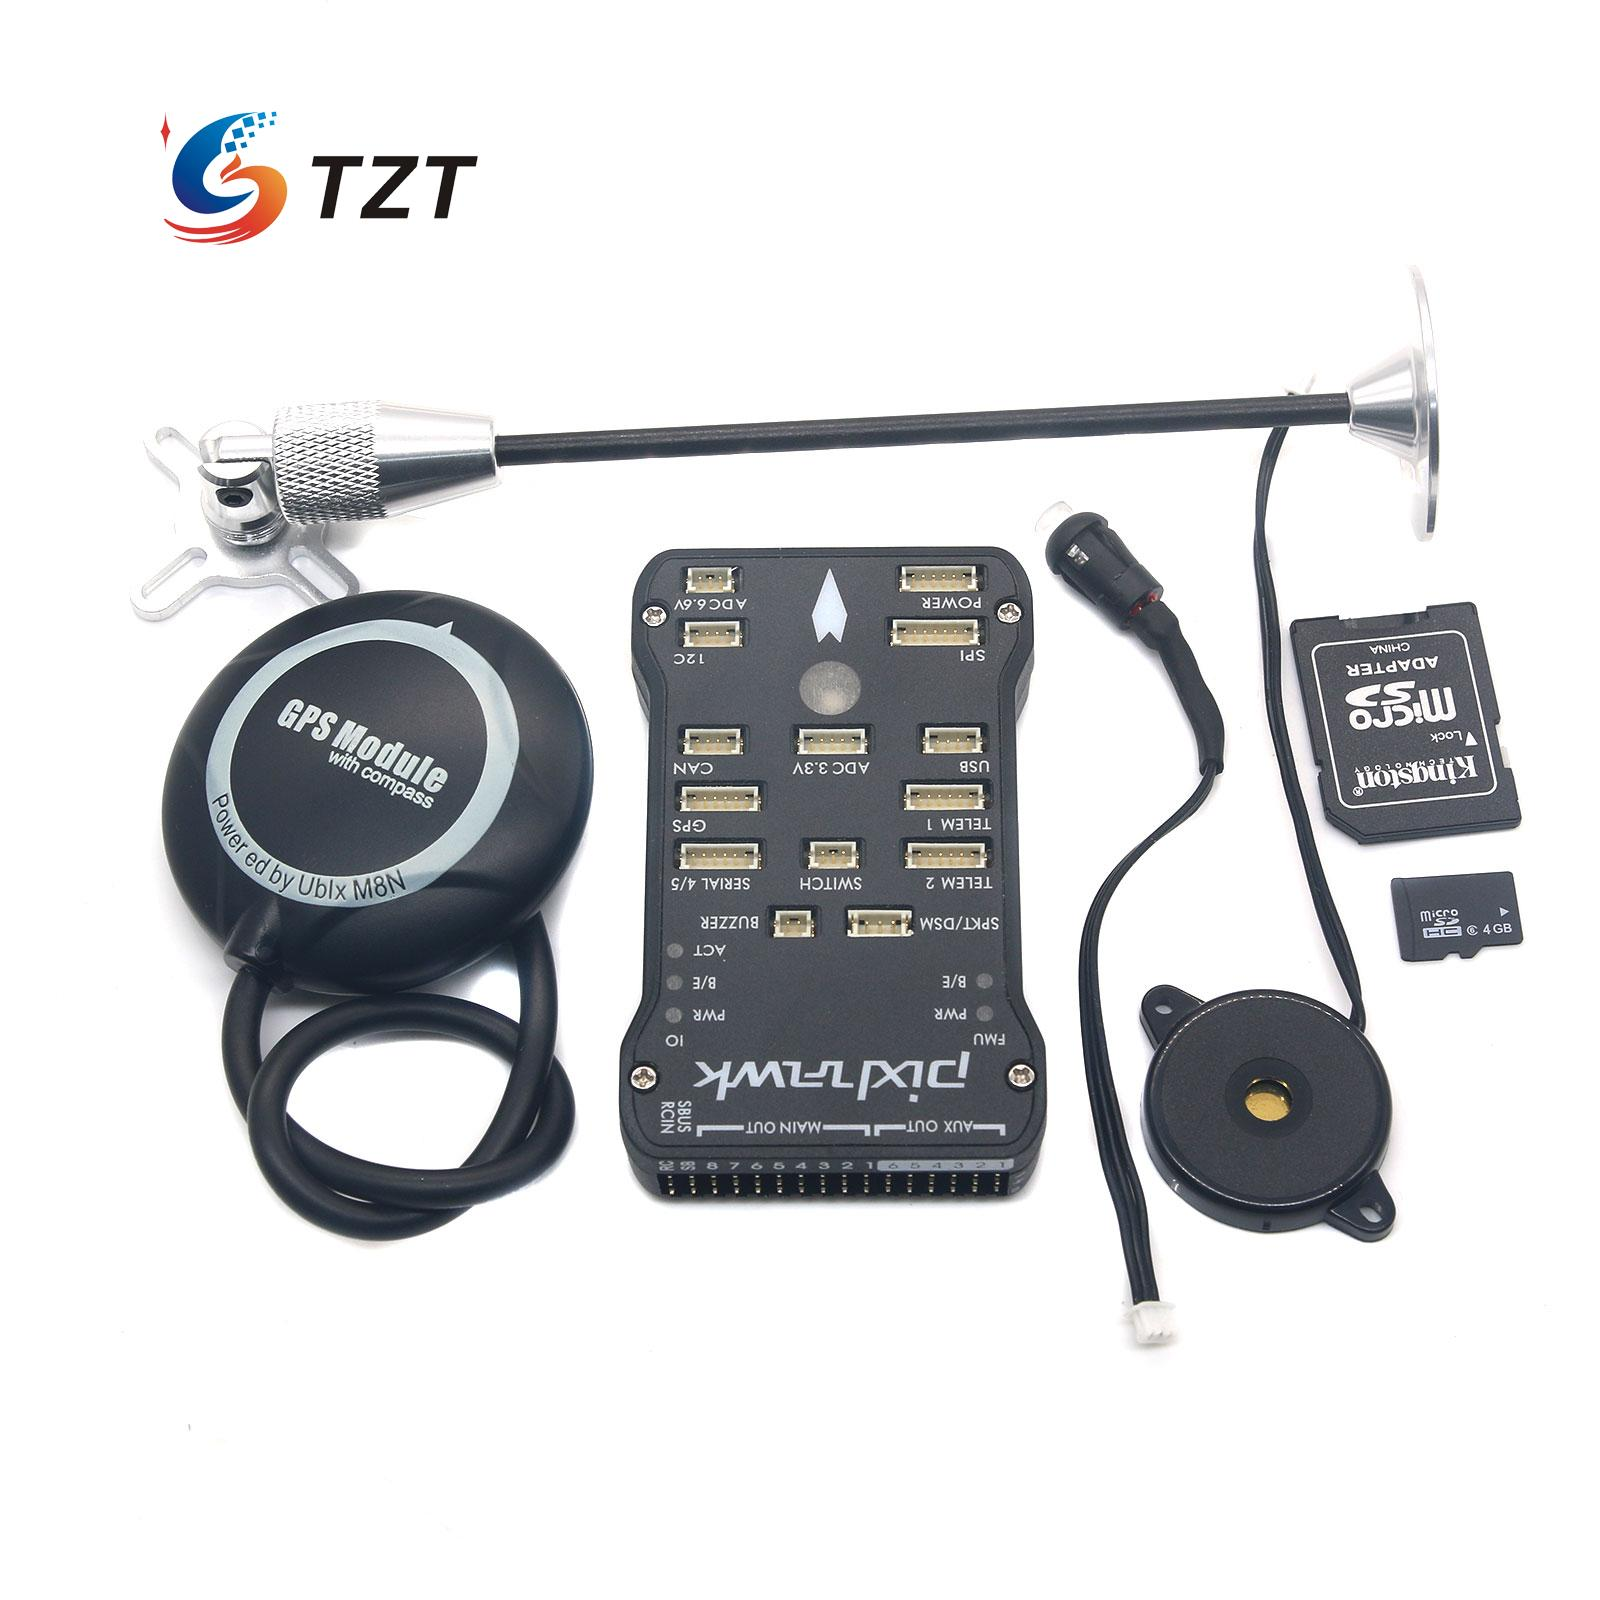 TZTPIX Pixhawk Fligtht Controller 32Bit + M8N GPA +SD 4G Card + GPS Bracket for FPV Quadopter Drone pixhawk flight control px4 2 4 8 new 32 bit m8n gps kit for uav multi axis fixed wing drone f22159